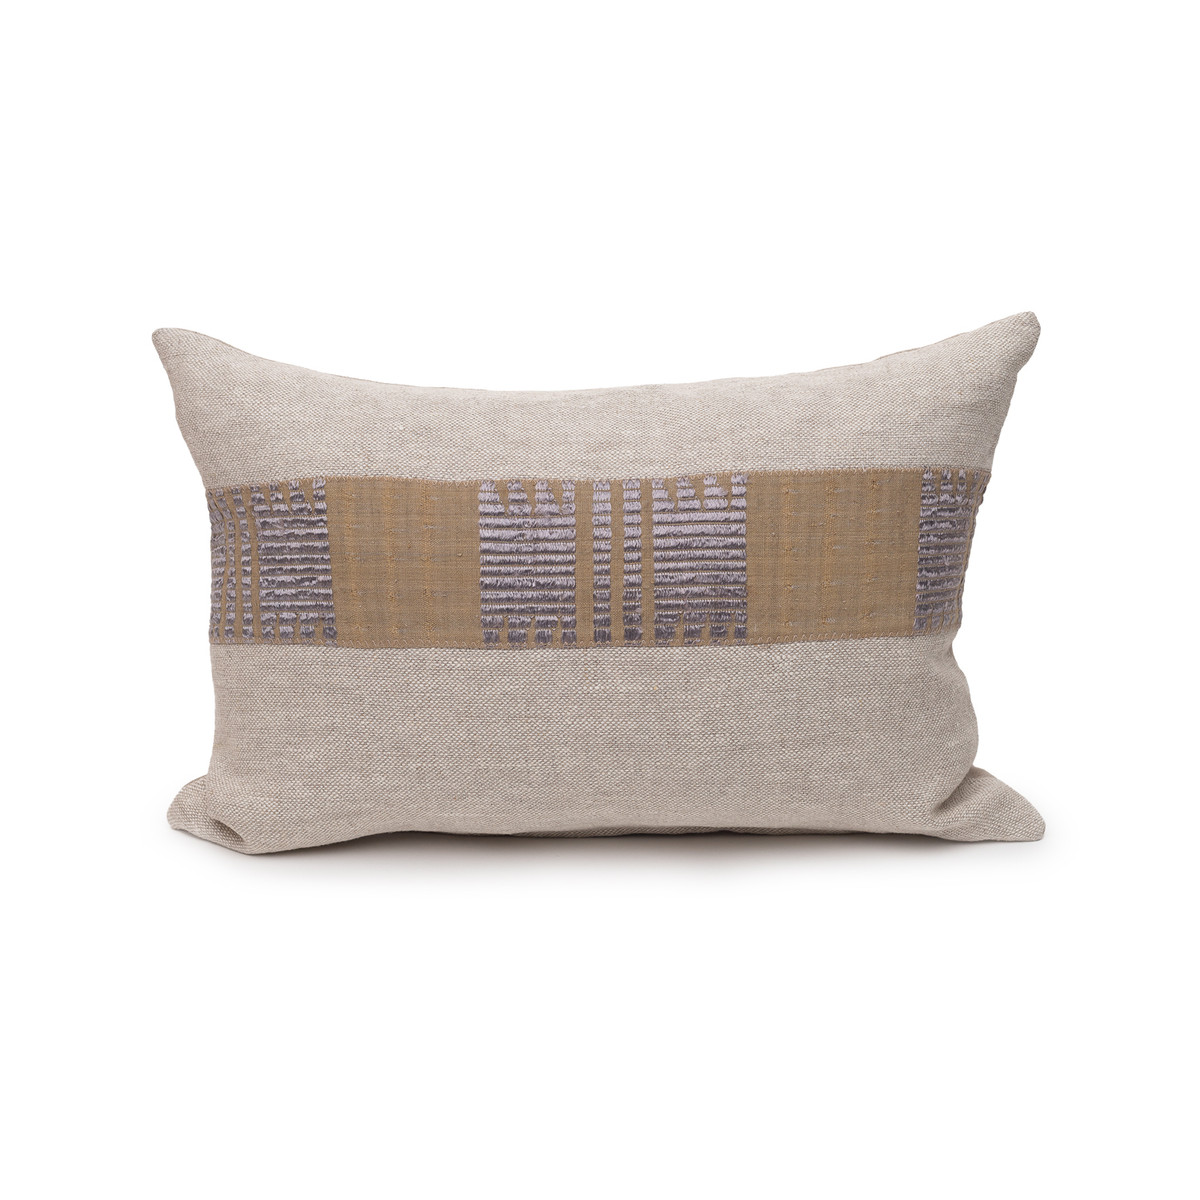 Anza Aso Oke Linen Pillow - 1420 - Front View